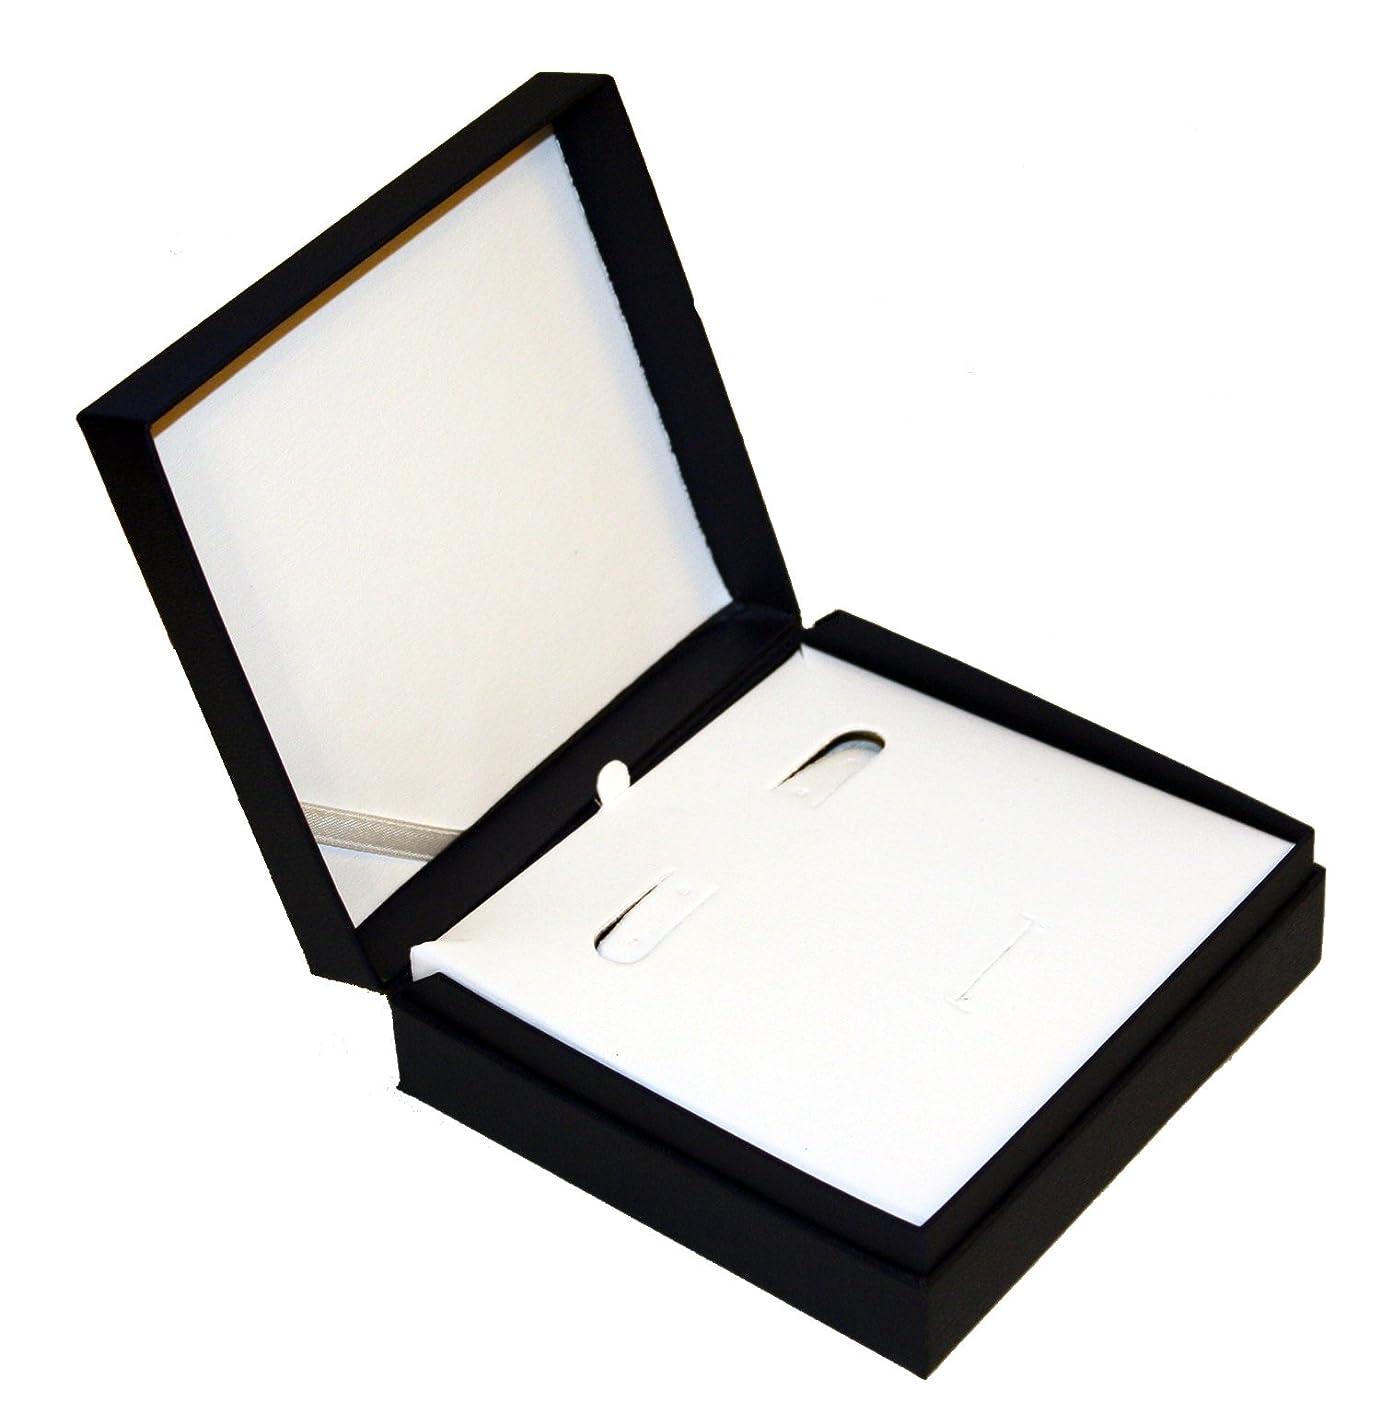 Matte Black Earring/Pendant Display Gift Box, Hinged Lid Insert 4.50